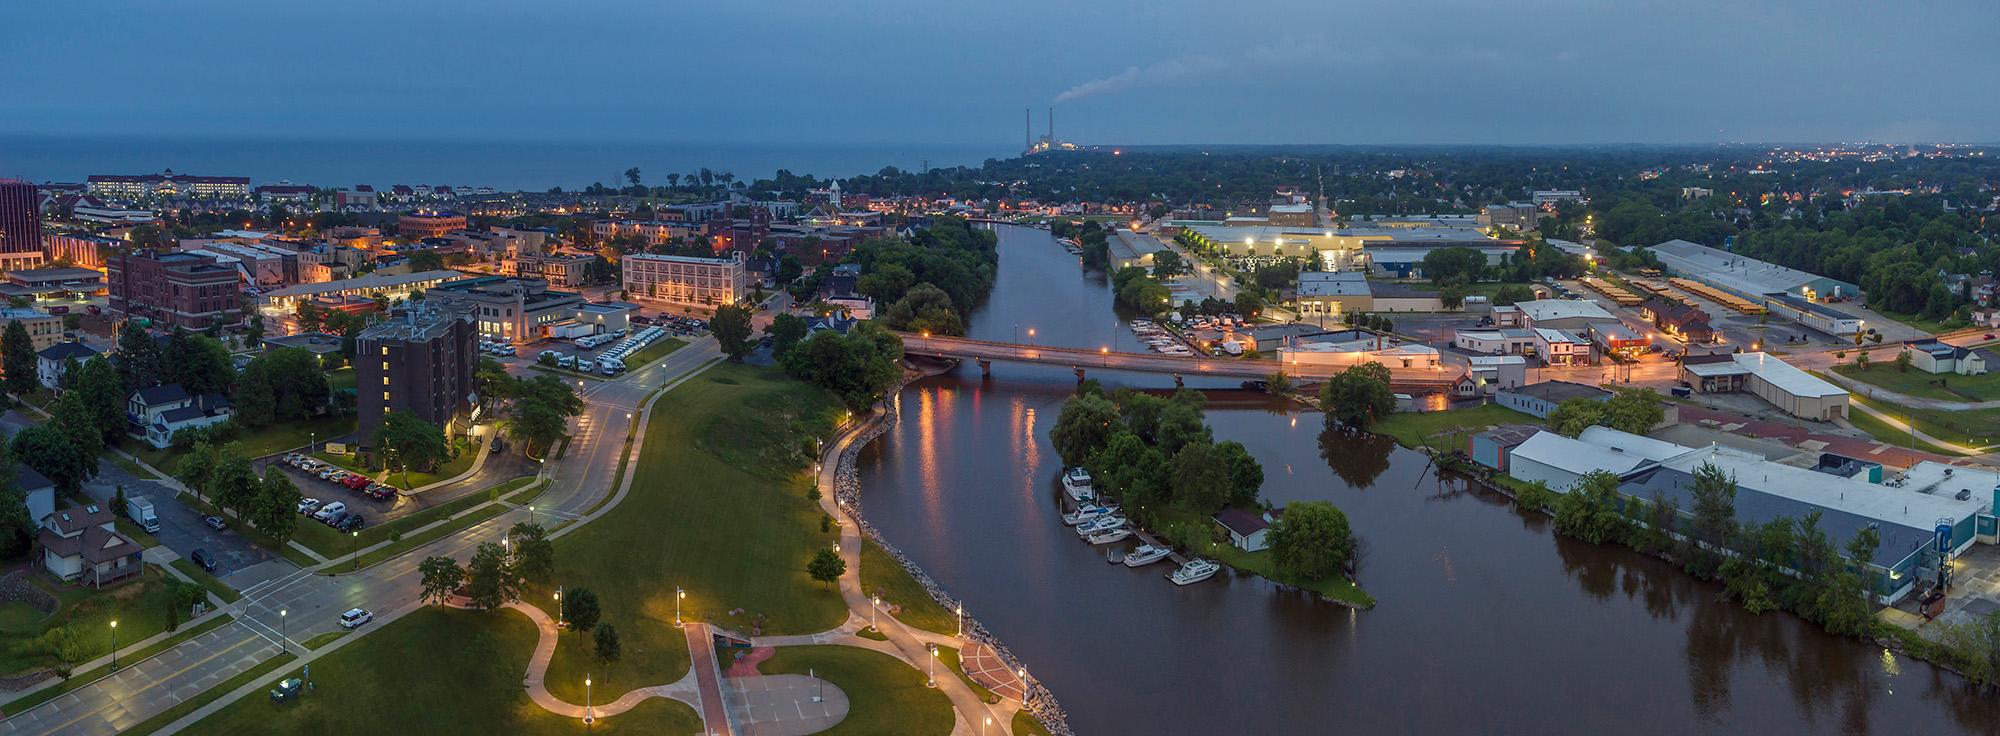 021_Peter_Essick-Sheboygan River_Wisconsin.jpg